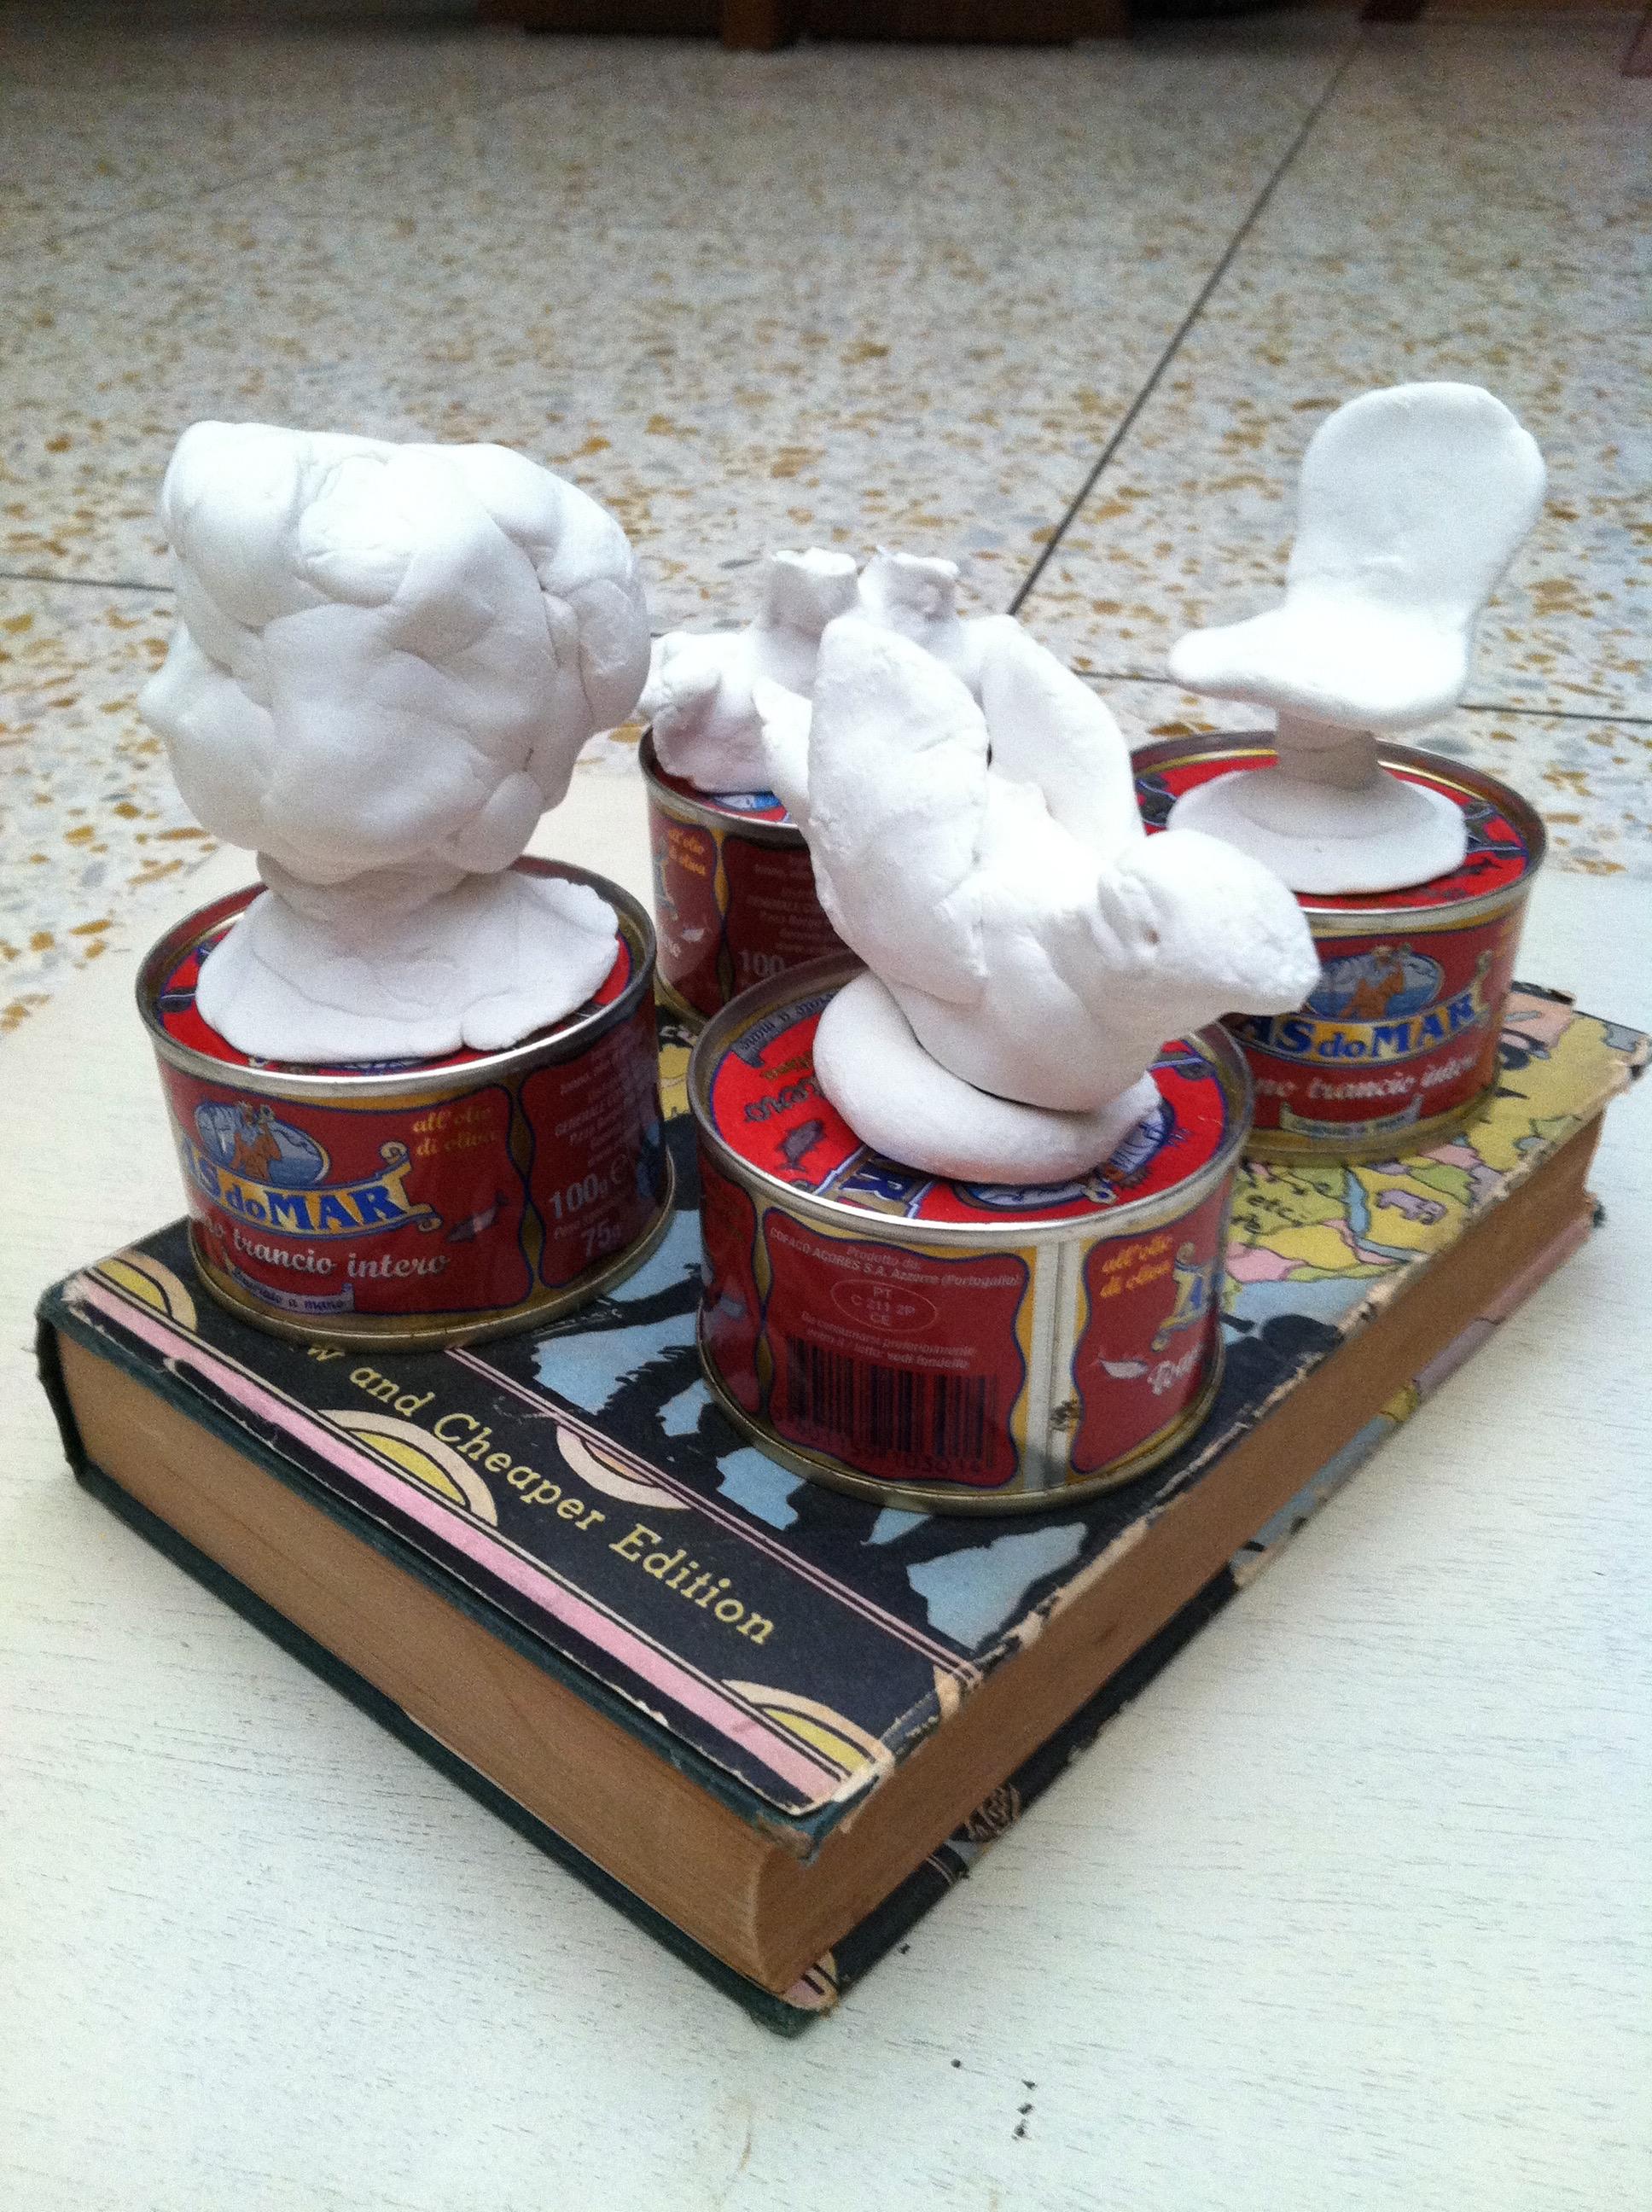 Plaster narrative sculptures from So Made workshop